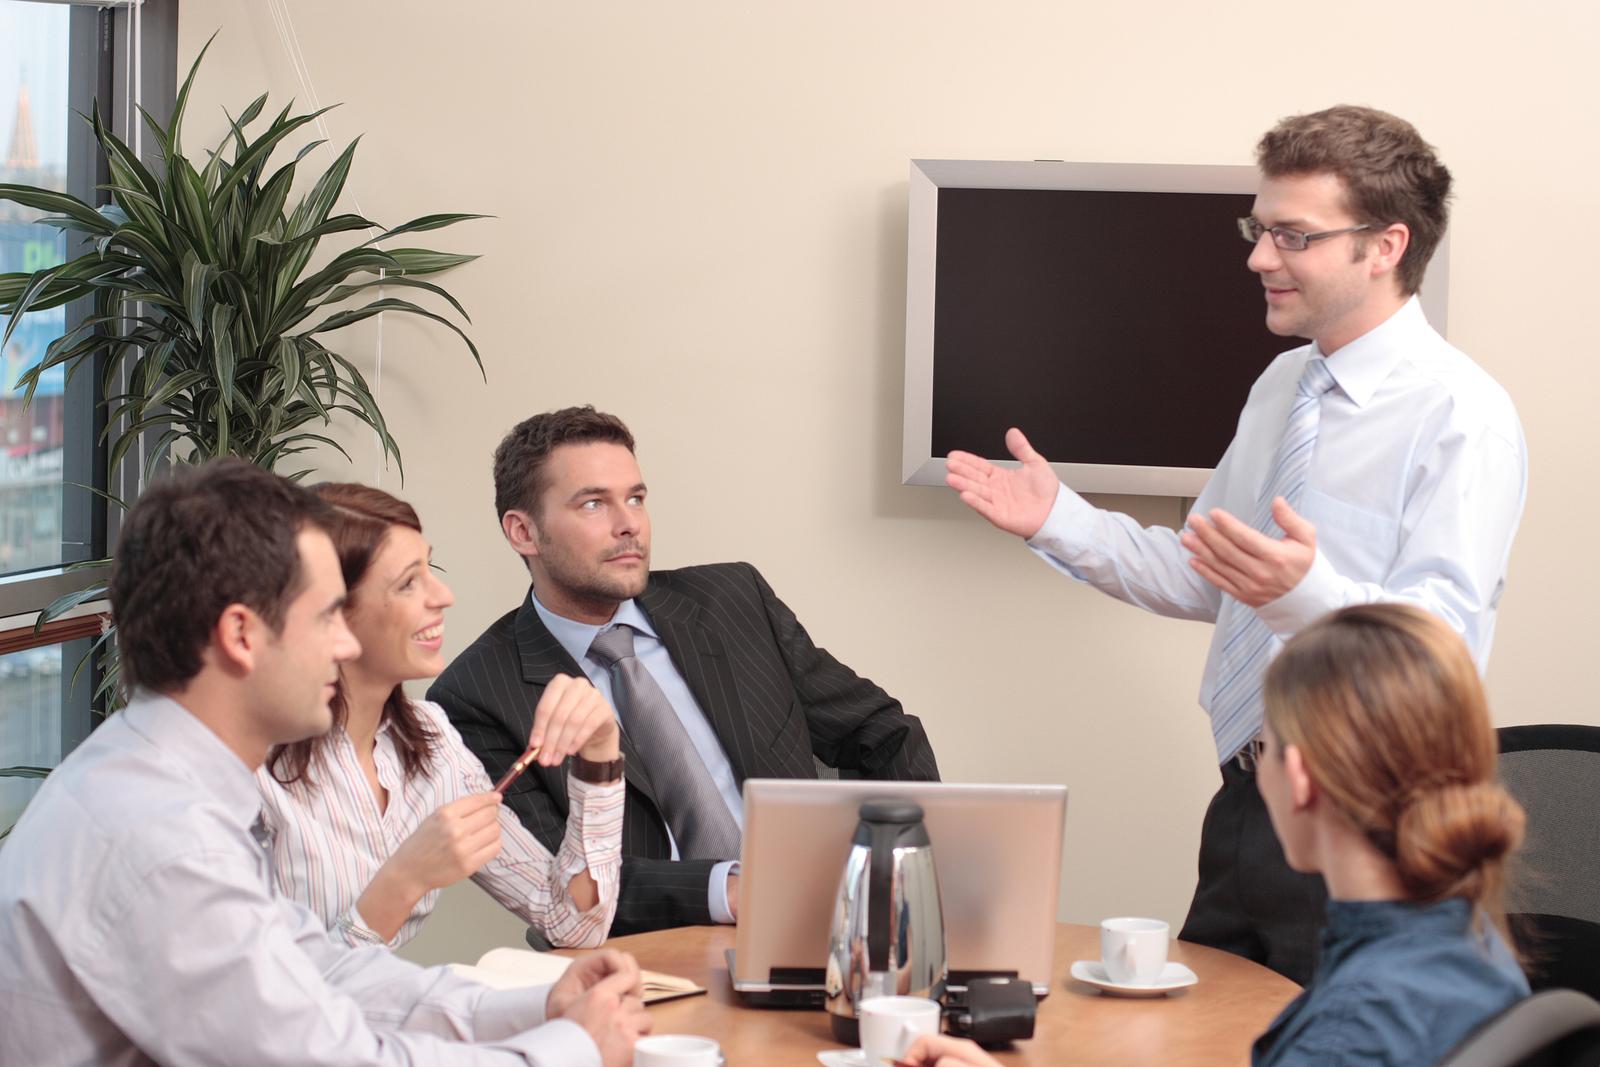 4 Ways To Maximize Your Professional Development